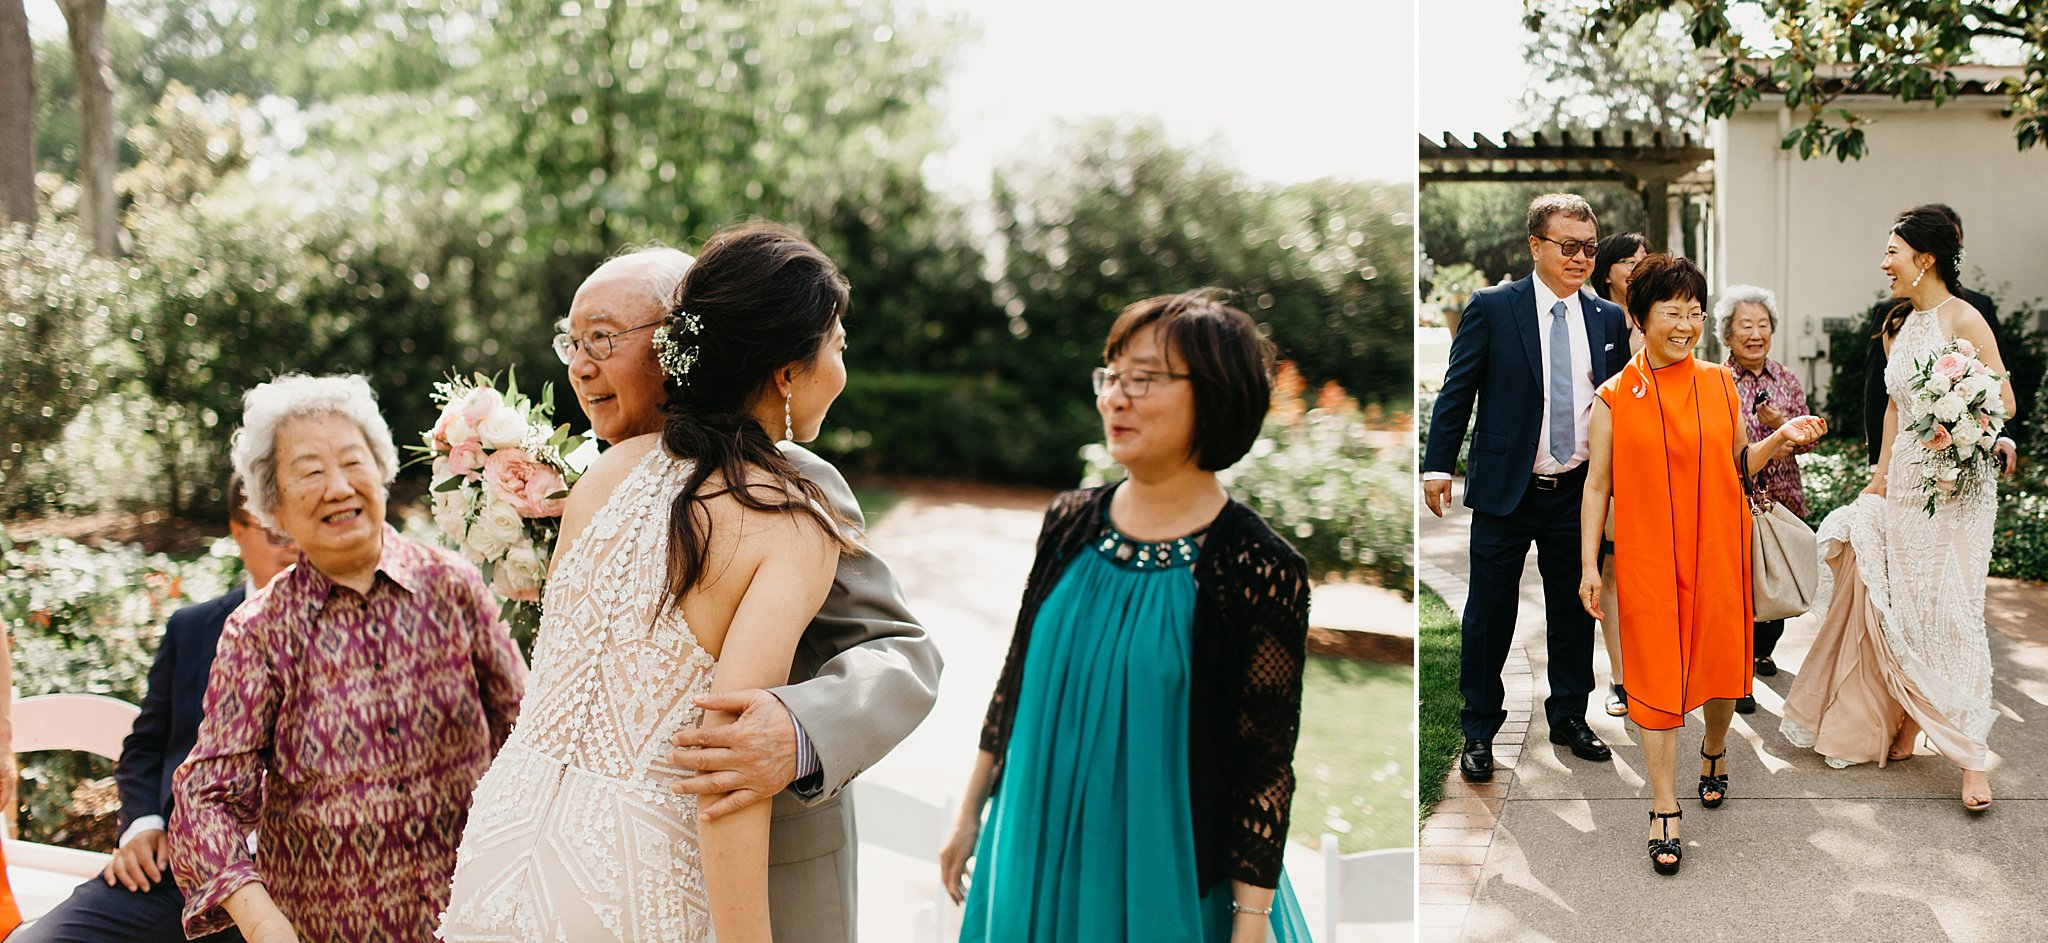 Wilderlove Co_Dallas Texas_Wedding Elopement_Arboretum_Photography_0024.jpg